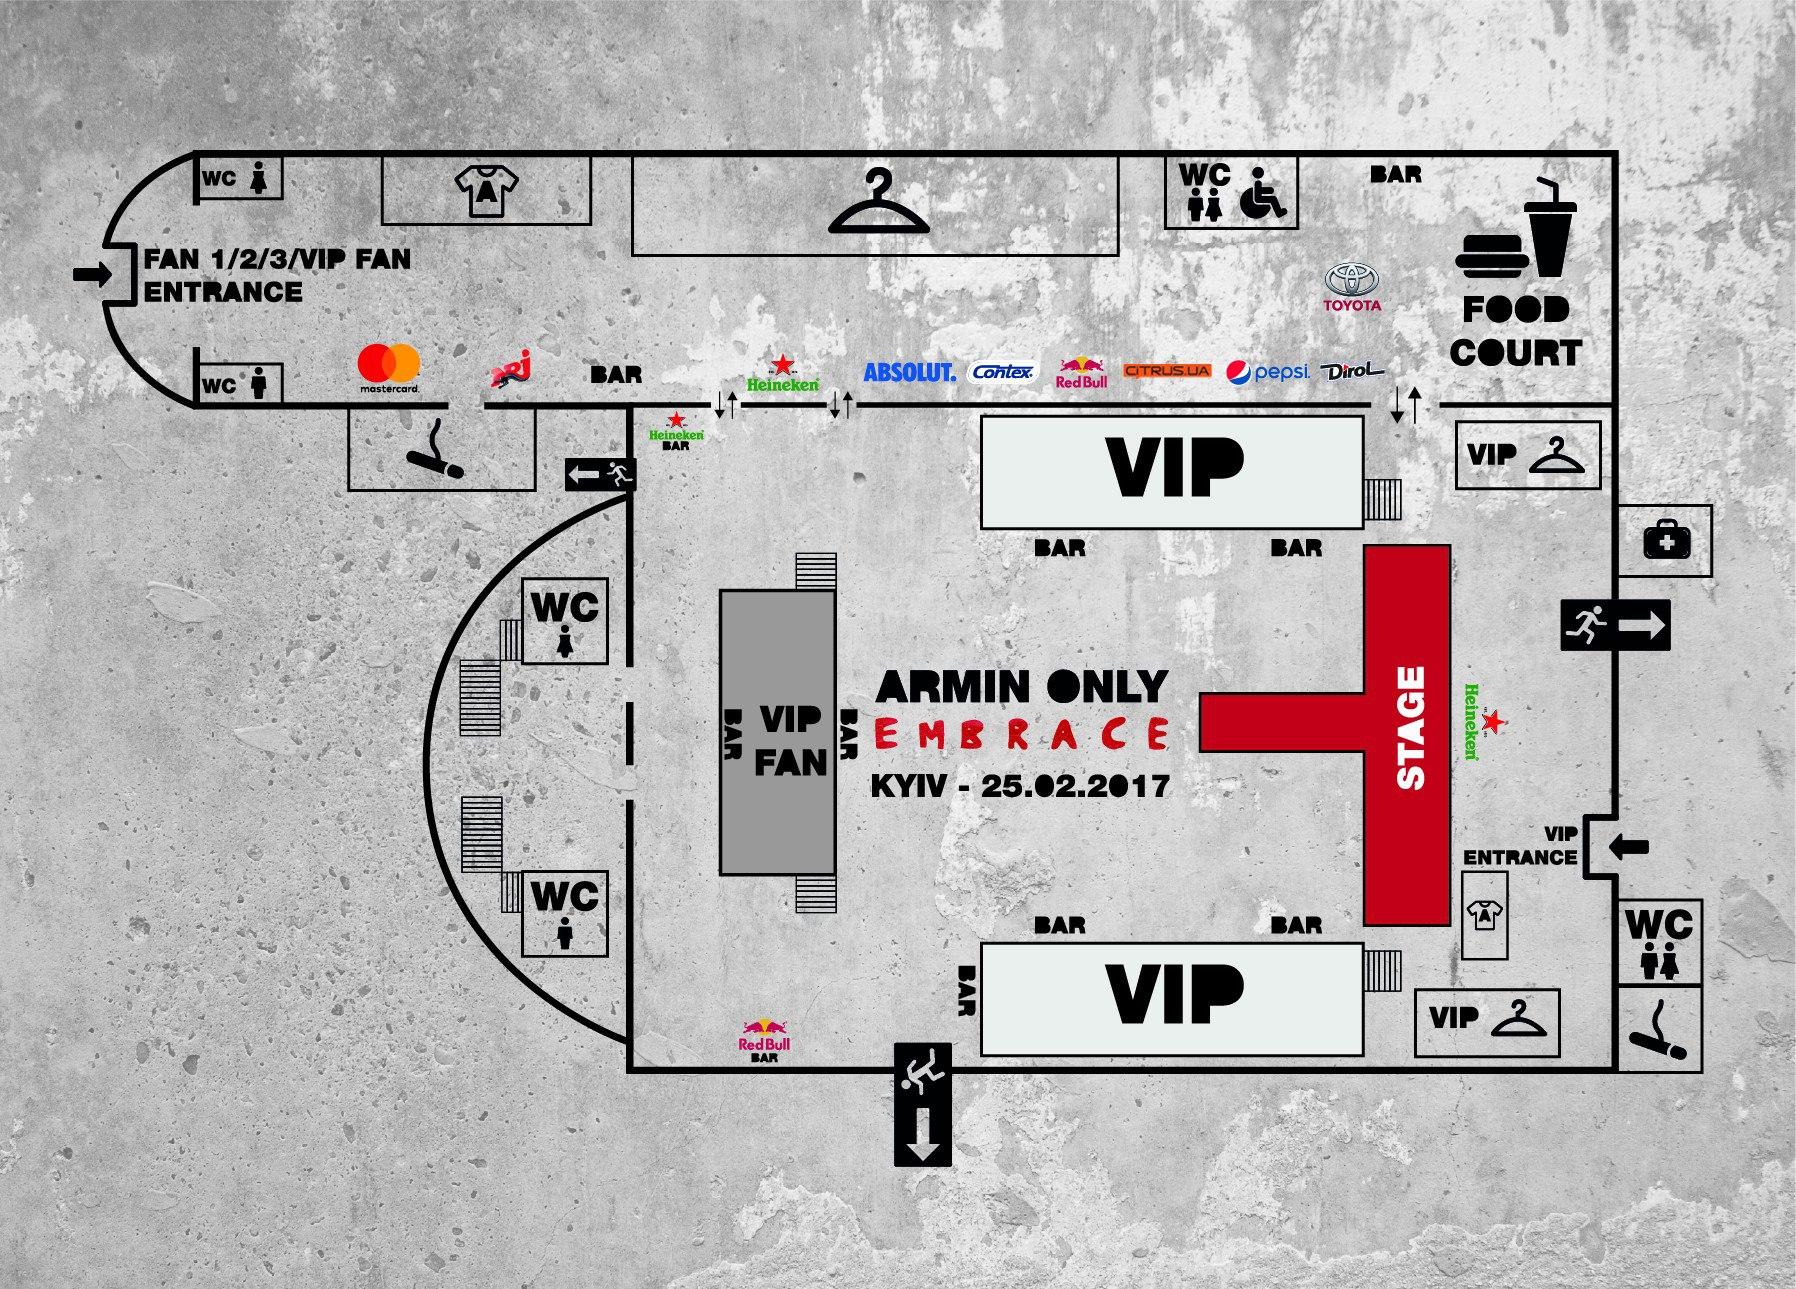 Схема зала Armin Only Embrace